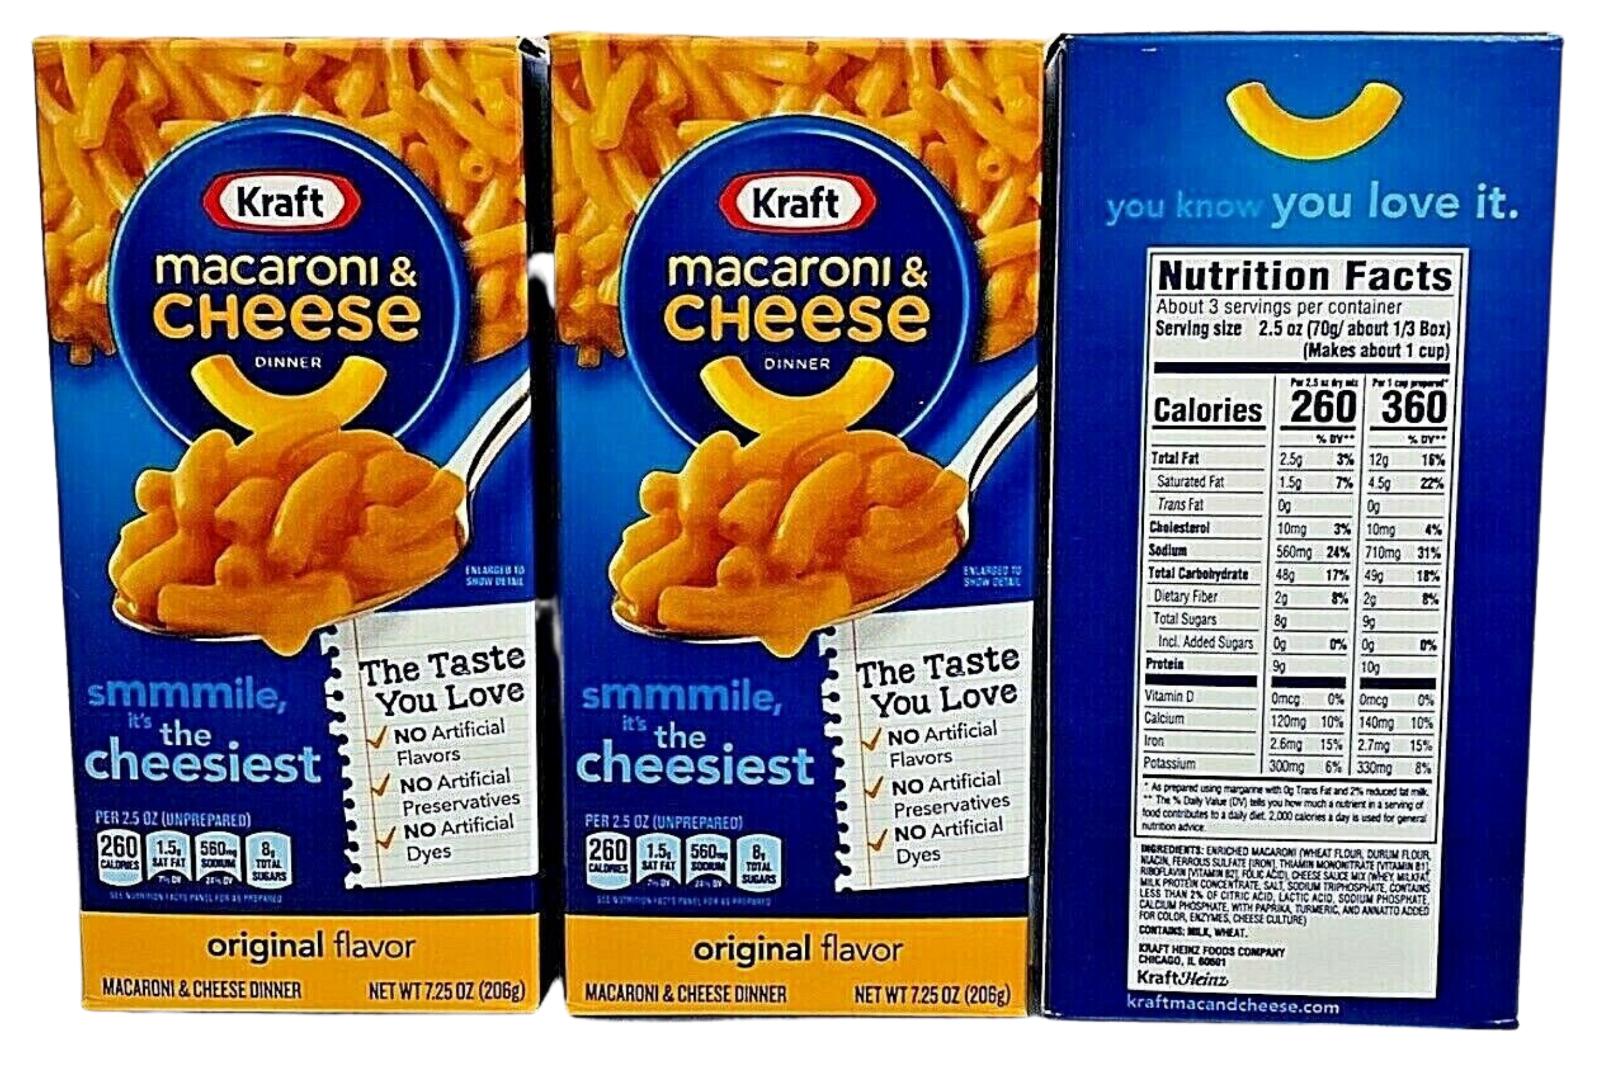 Kraft Original Flavor Macaroni & Cheese Dinner  7.25 oz - (3 Boxes)